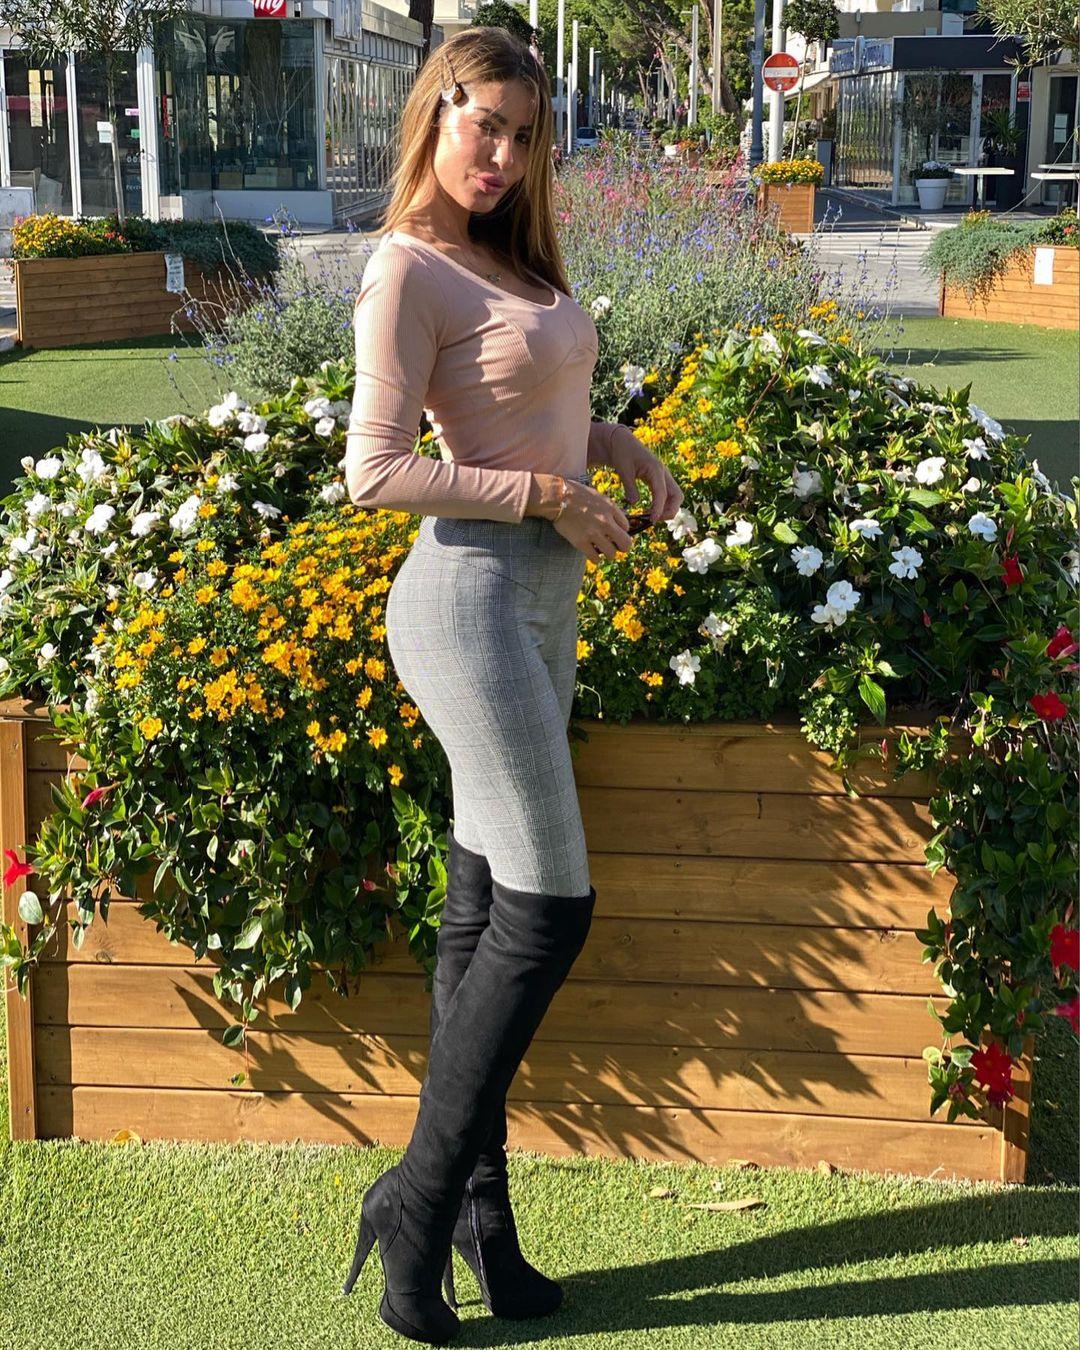 Jessica-Zanazzi-Wallpapers-Insta-Fit-Bio-6